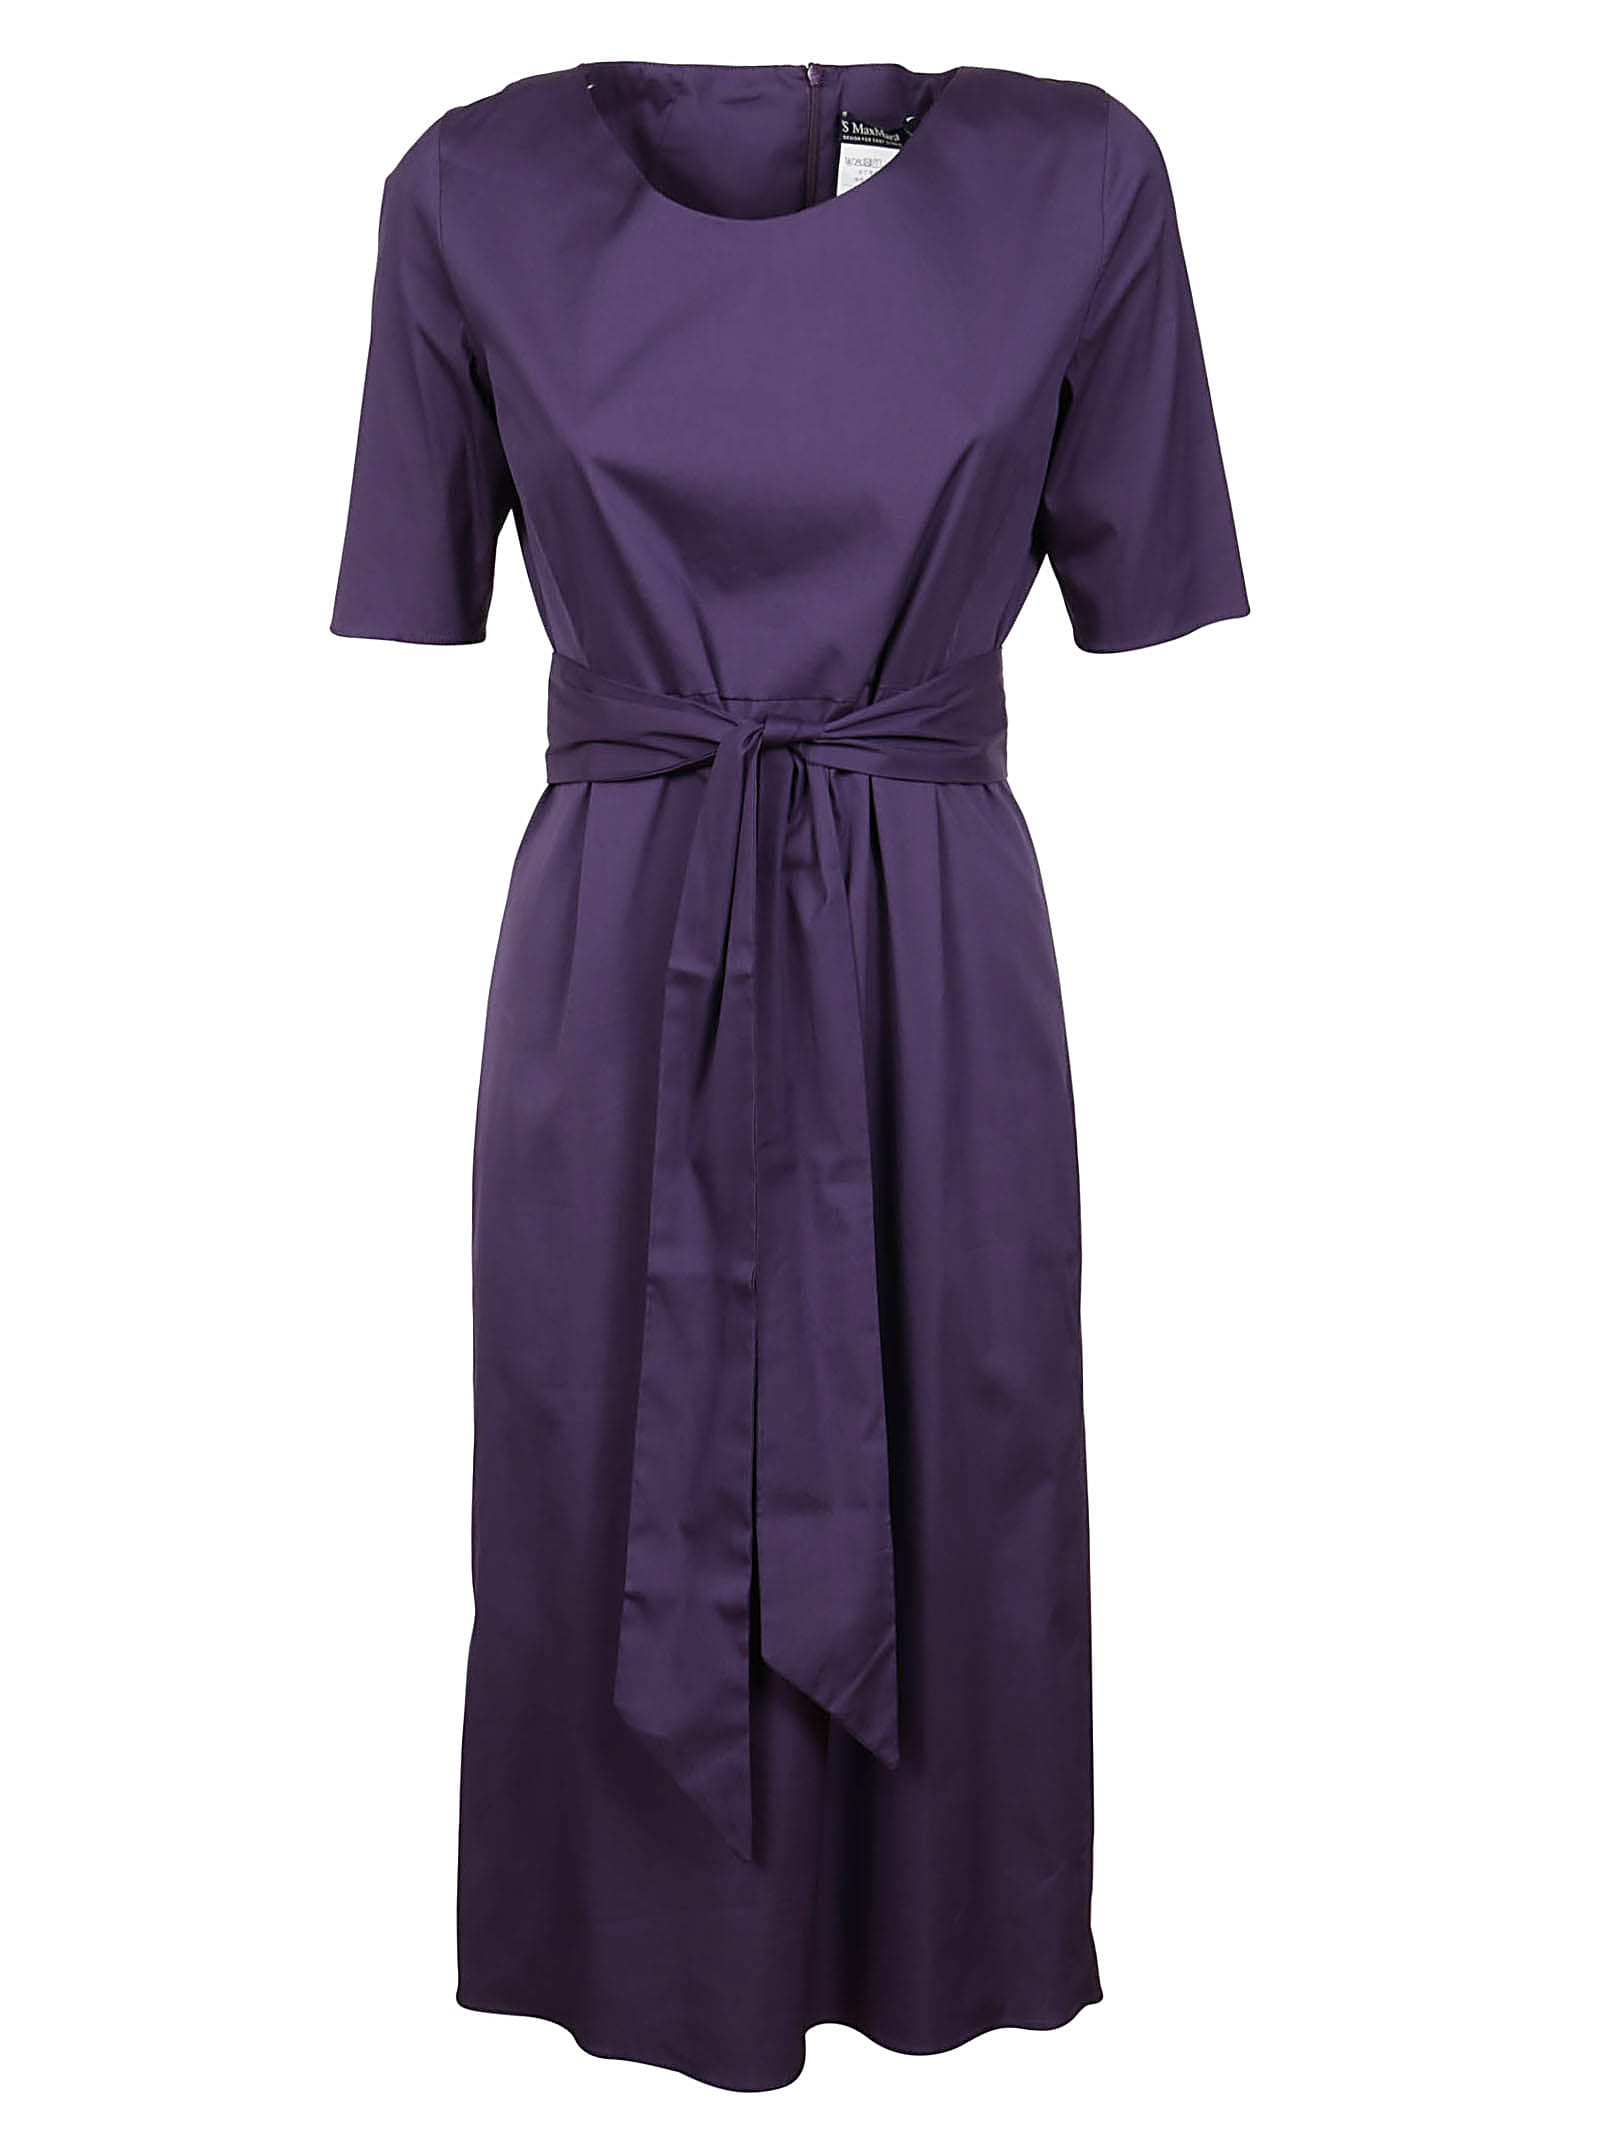 Buy S Max Mara Purple Cotton Dress online, shop S Max Mara with free shipping